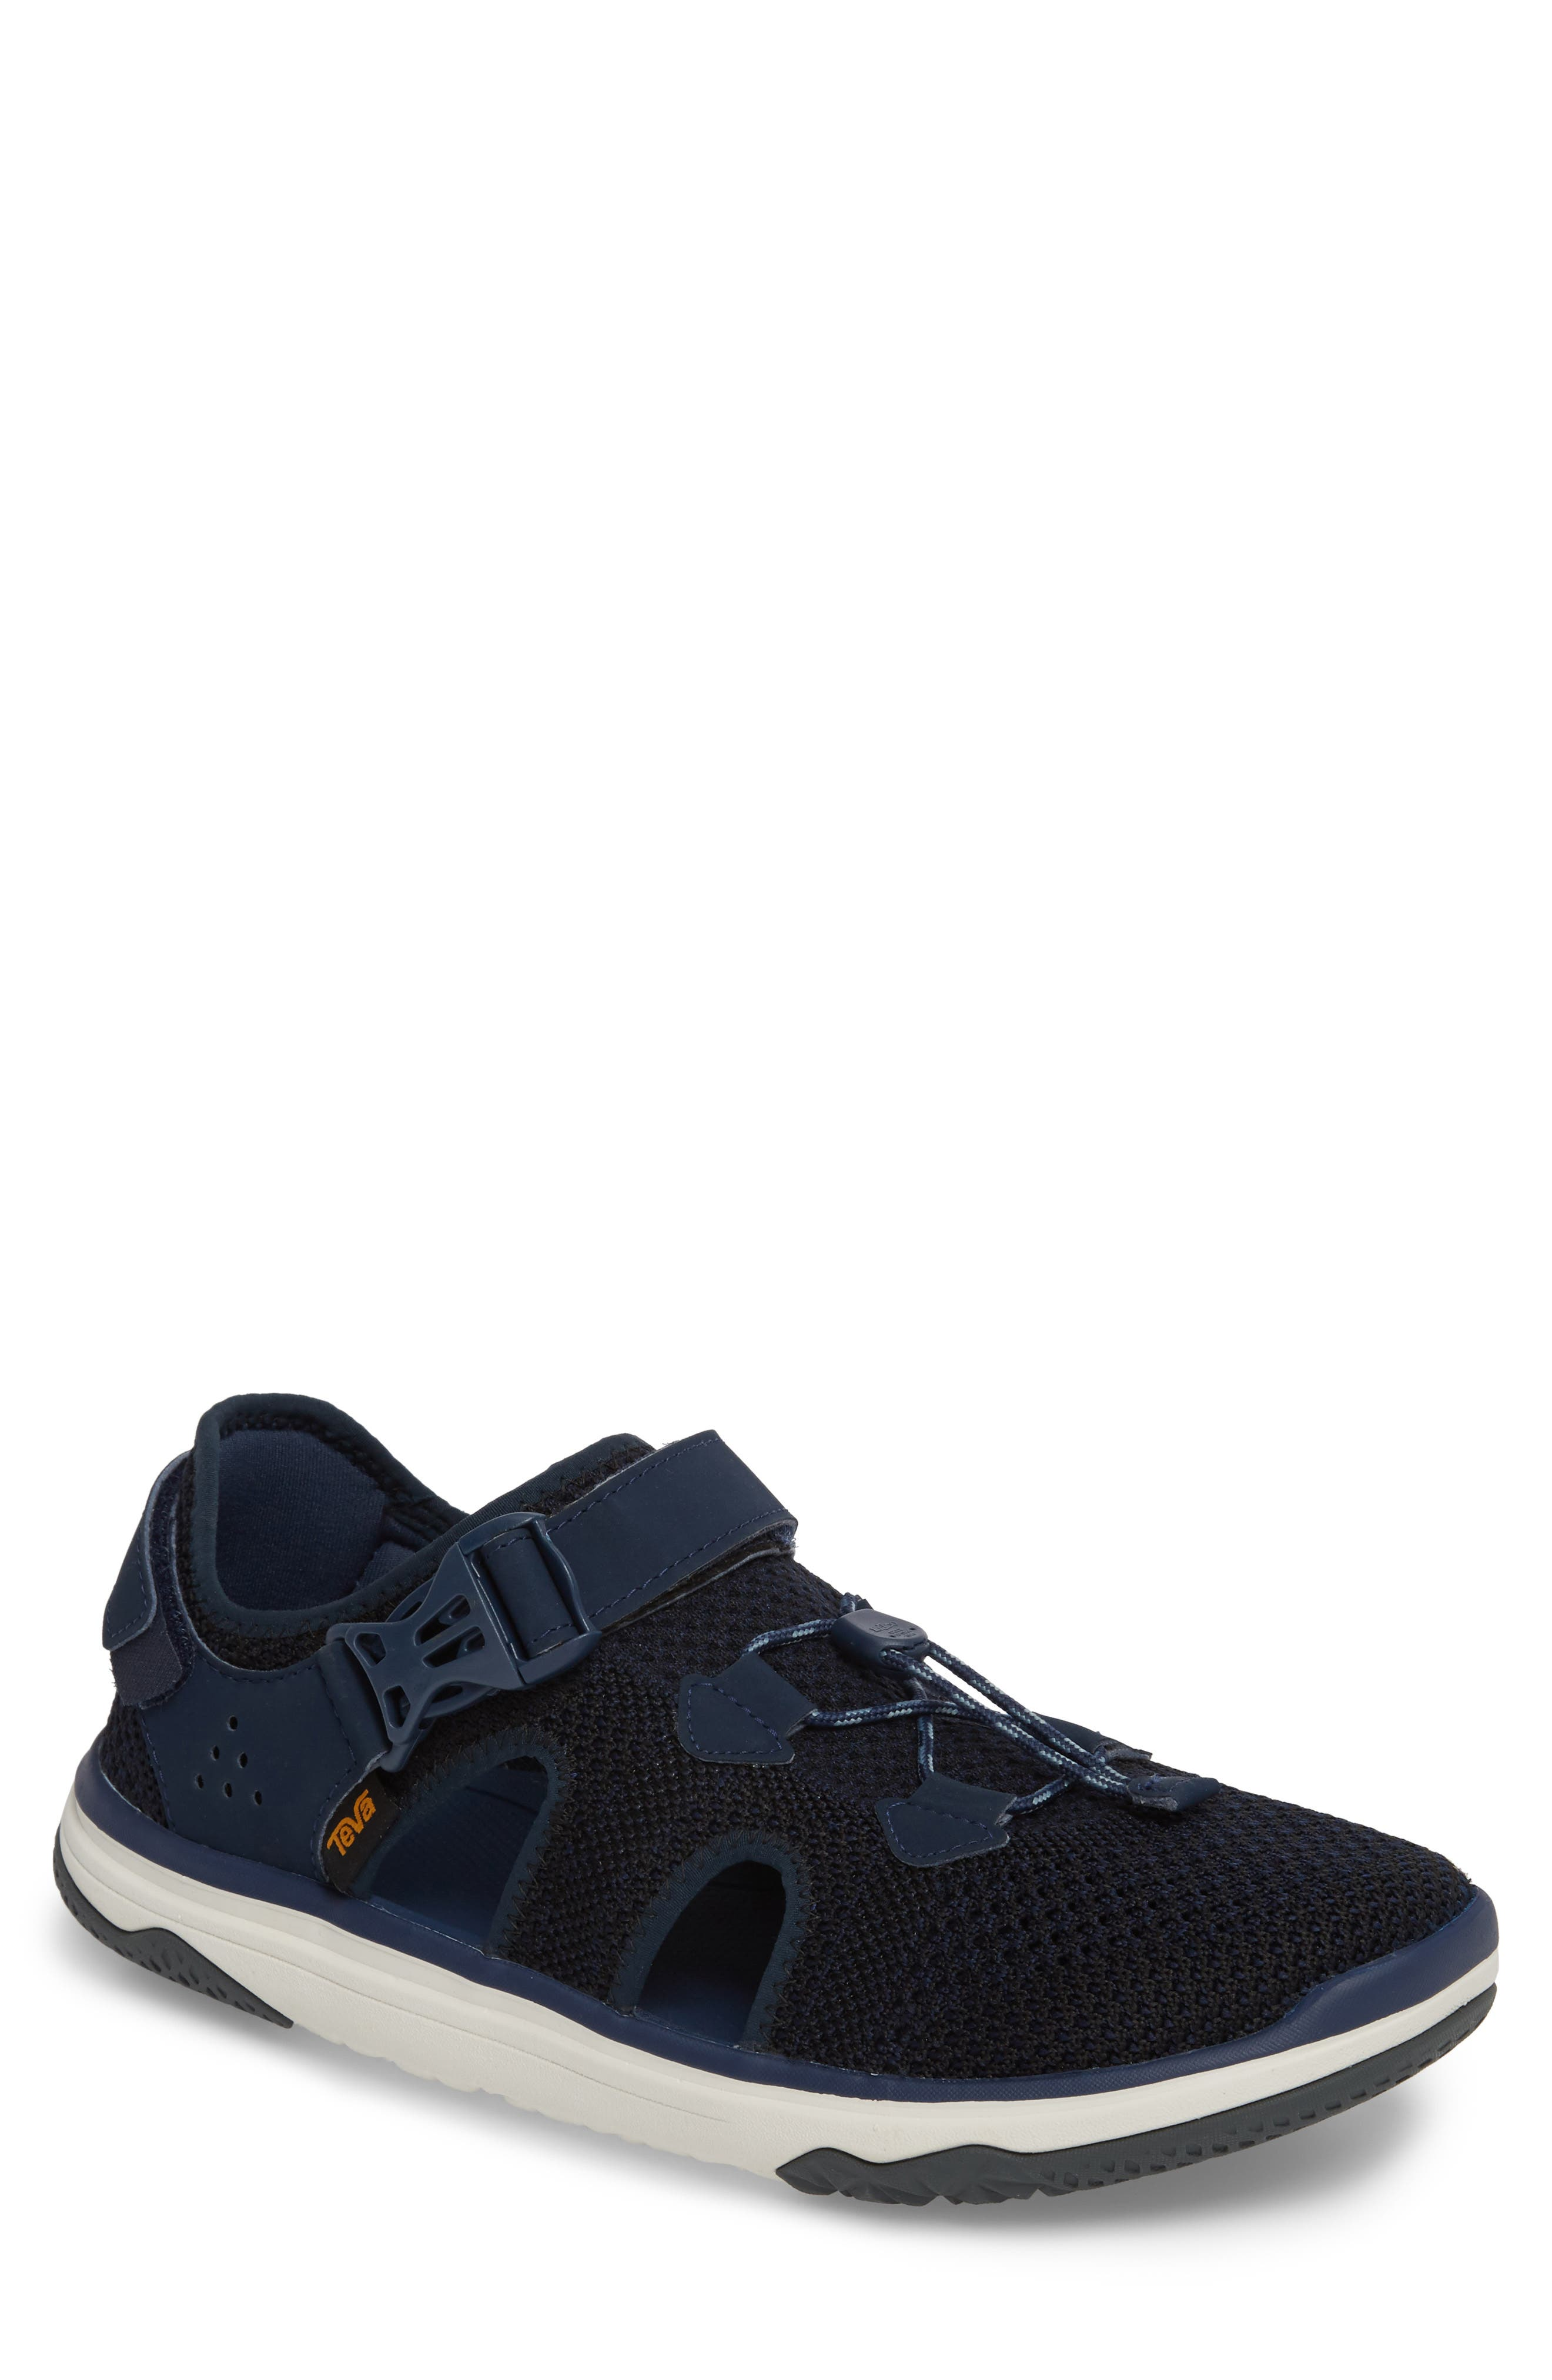 Terra Float Travel Sneaker,                         Main,                         color, Navy Knit